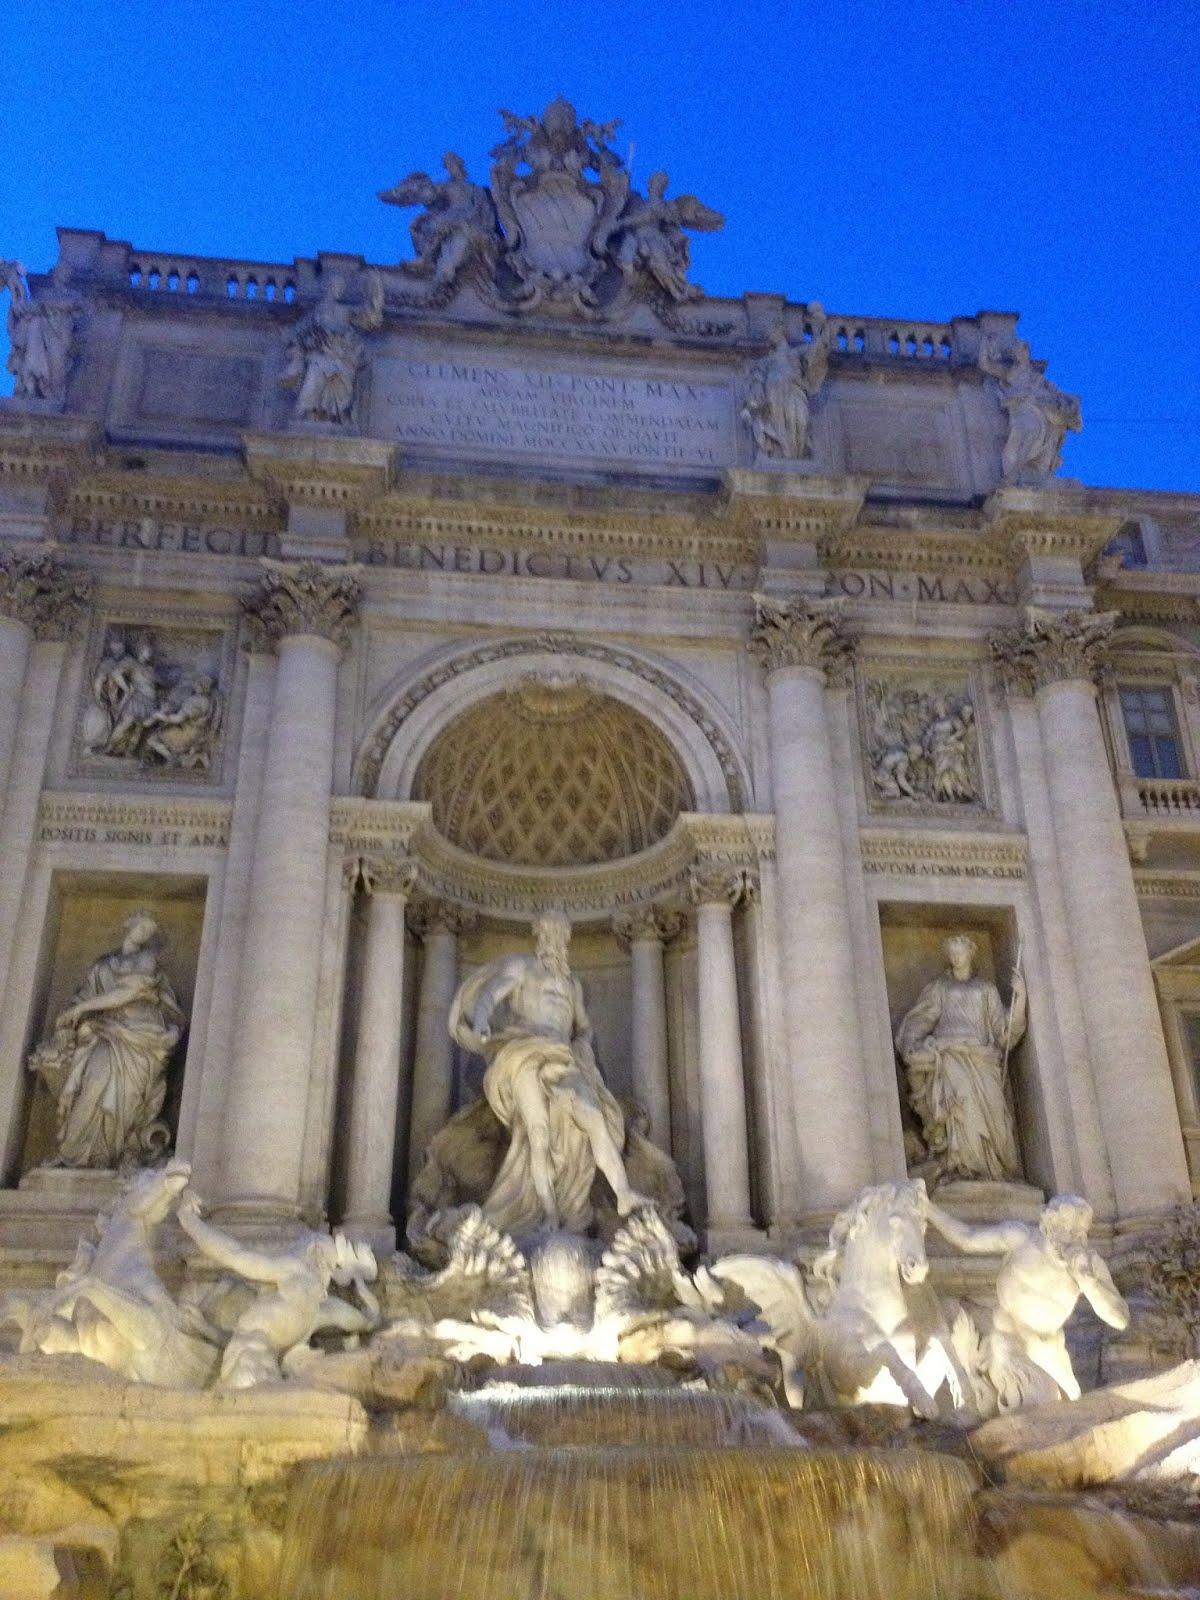 Trevi Fountain - Fountains of Rome